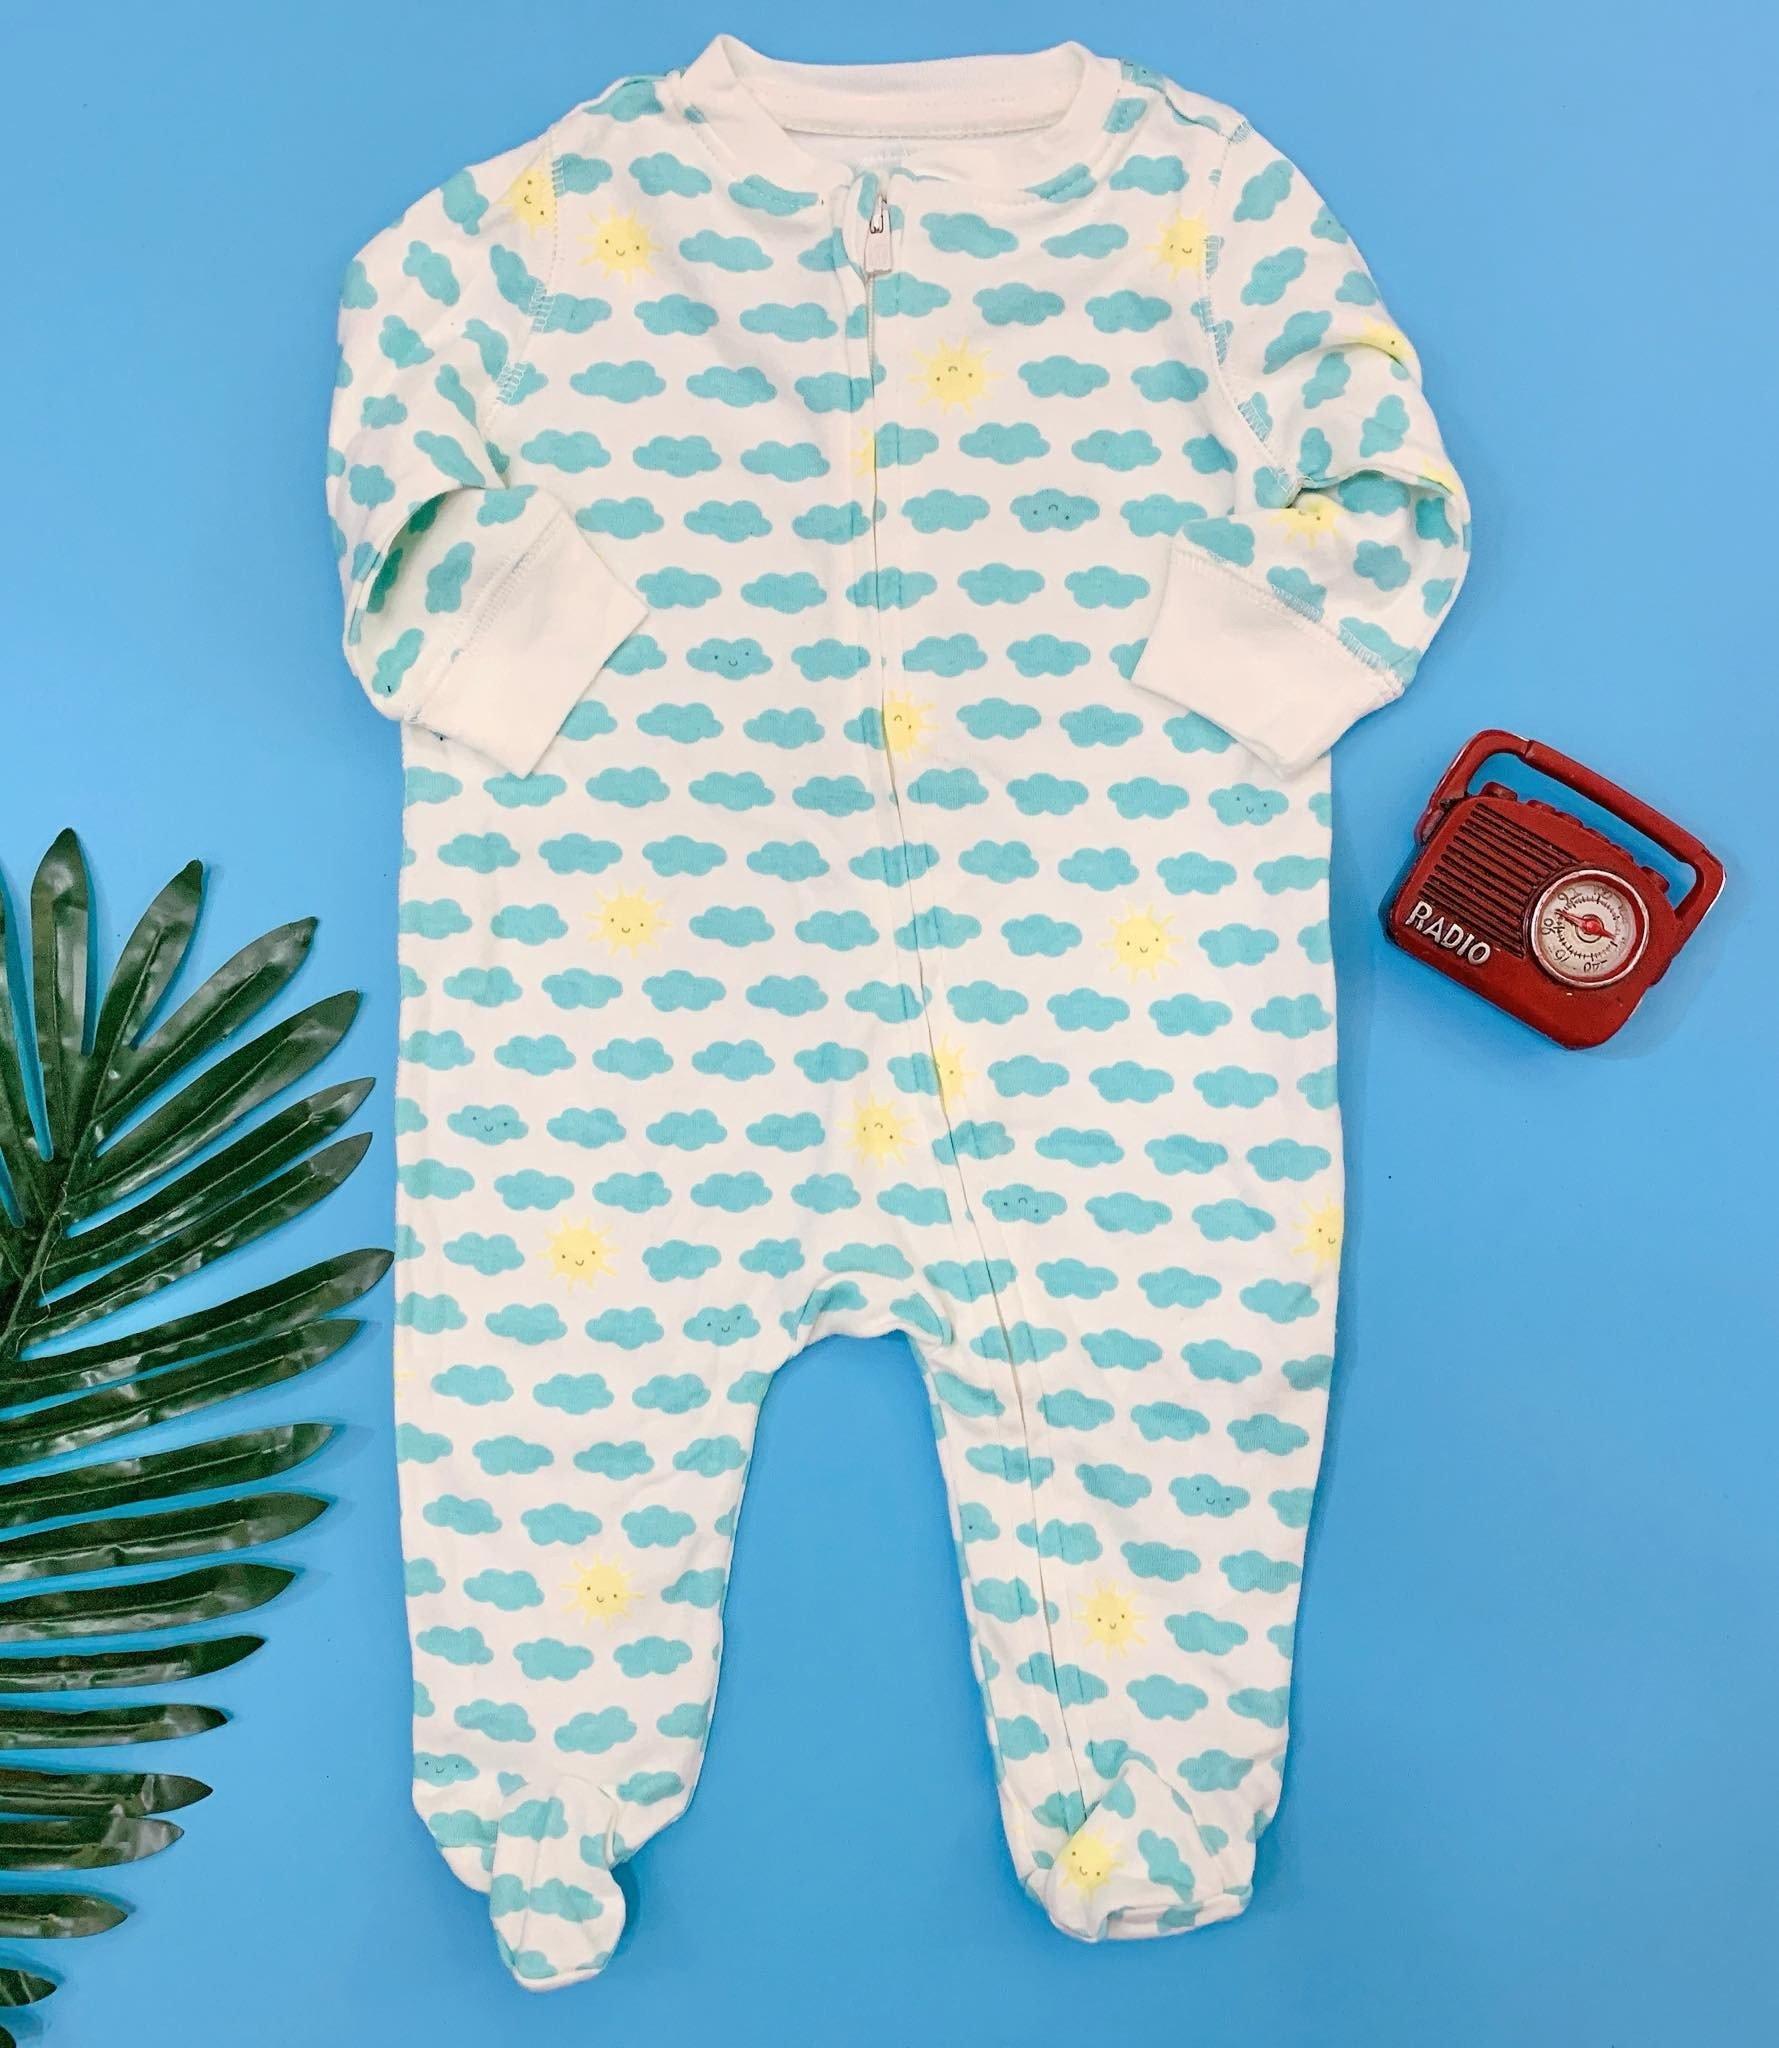 [5-10kg] Sleepsuit Baby Gap 56 [Boy] - Trắng/Mặt Trời